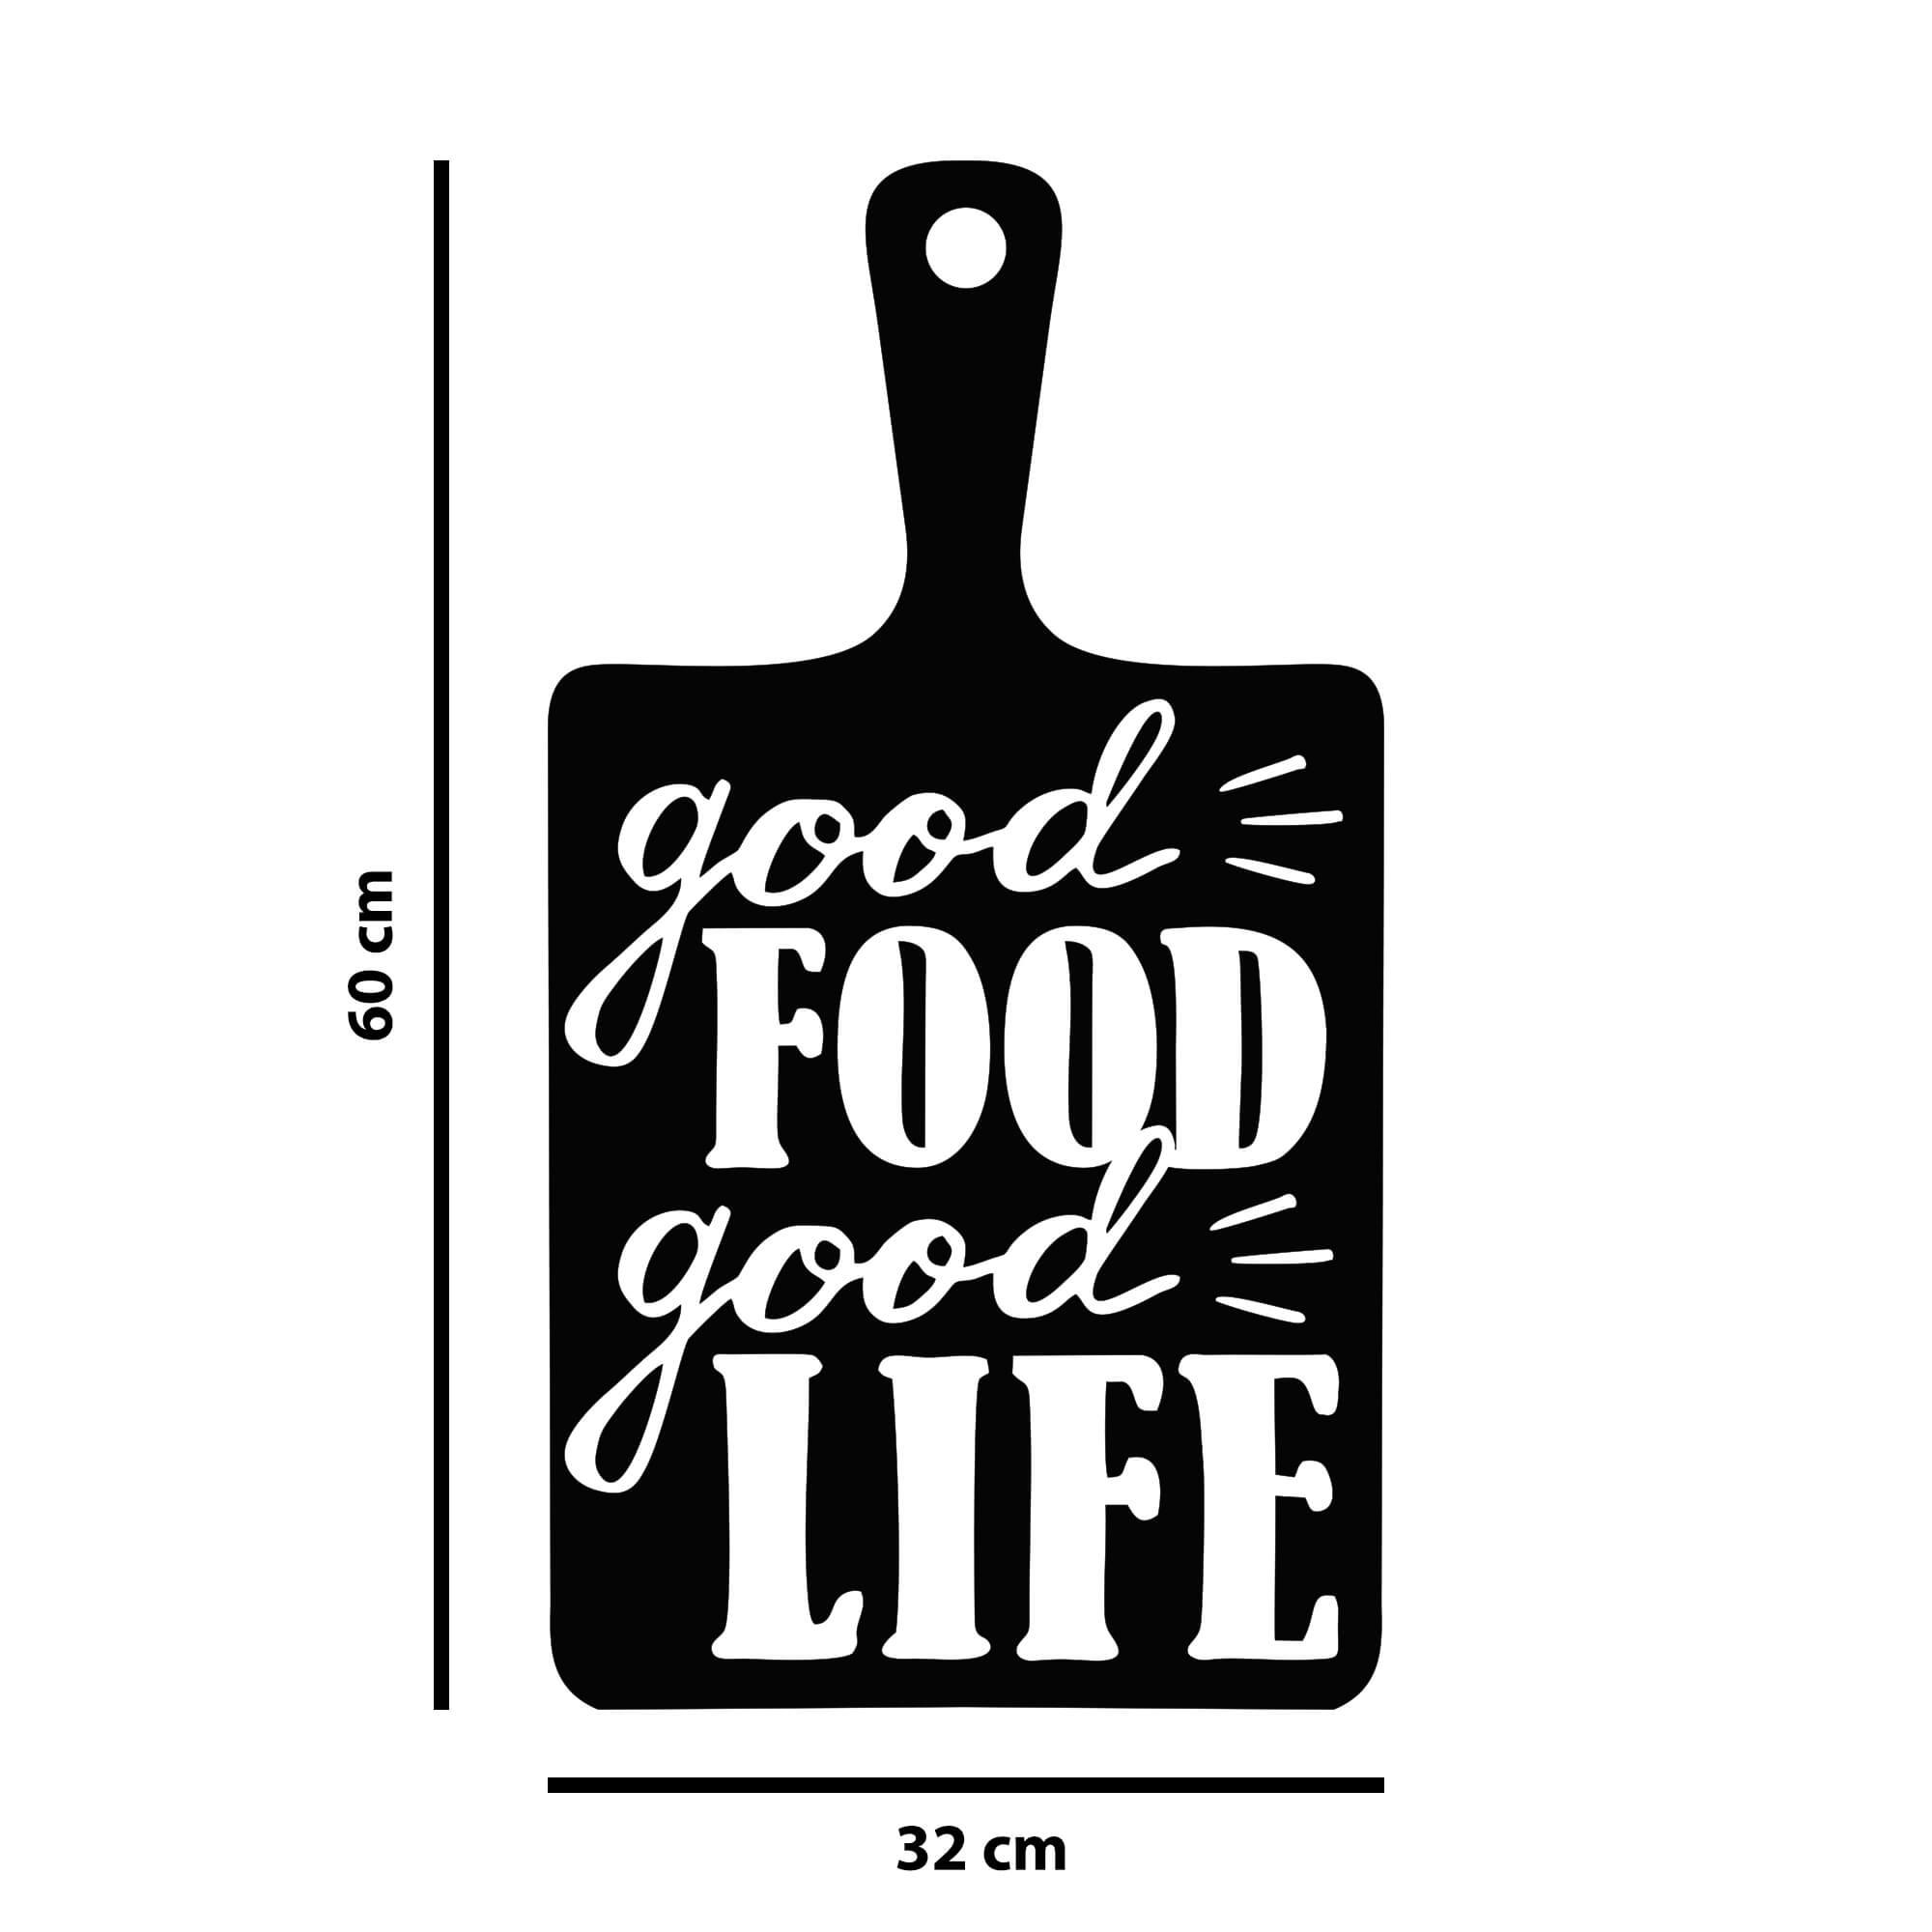 Adesivo Decorativo de Parede Taboa de Carnes Good Food Good Life